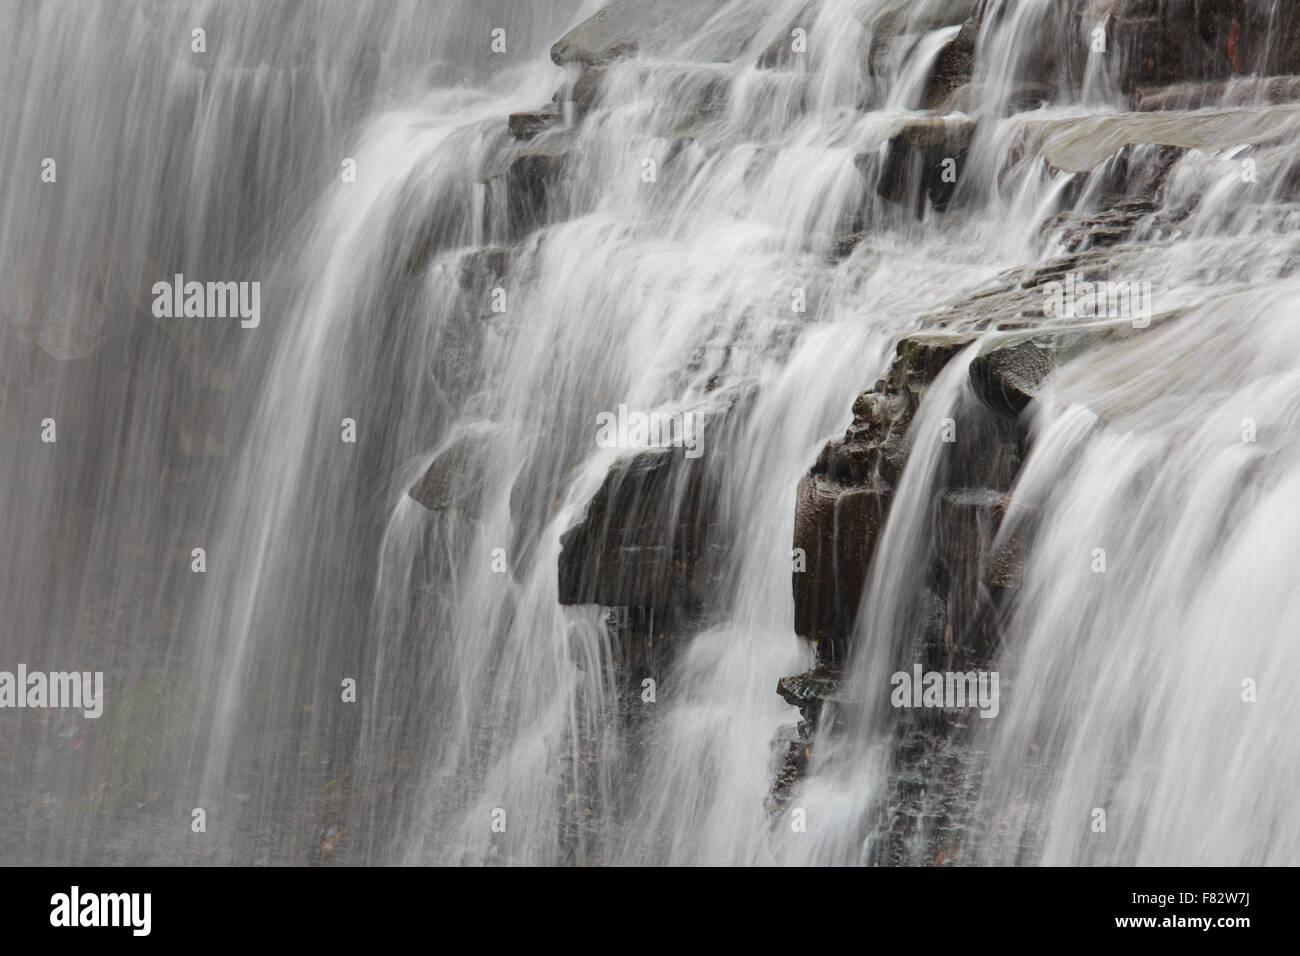 Details of Brandywine Falls, Cuyahoga Valley National Park, Ohio - Stock Image